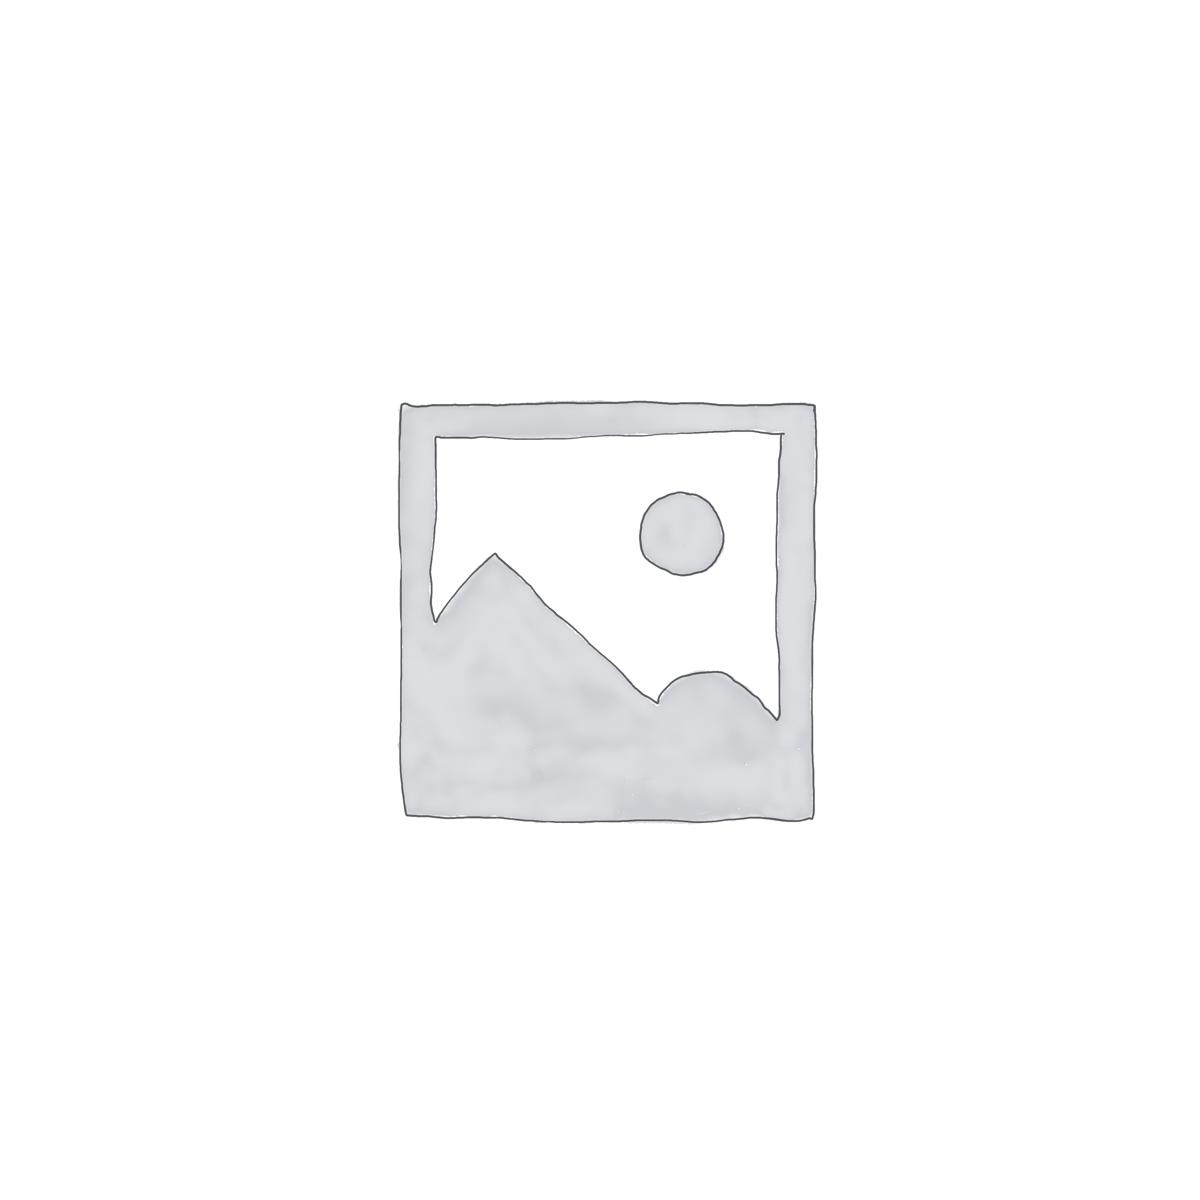 3D Look Vintage Car Wallpaper Mural